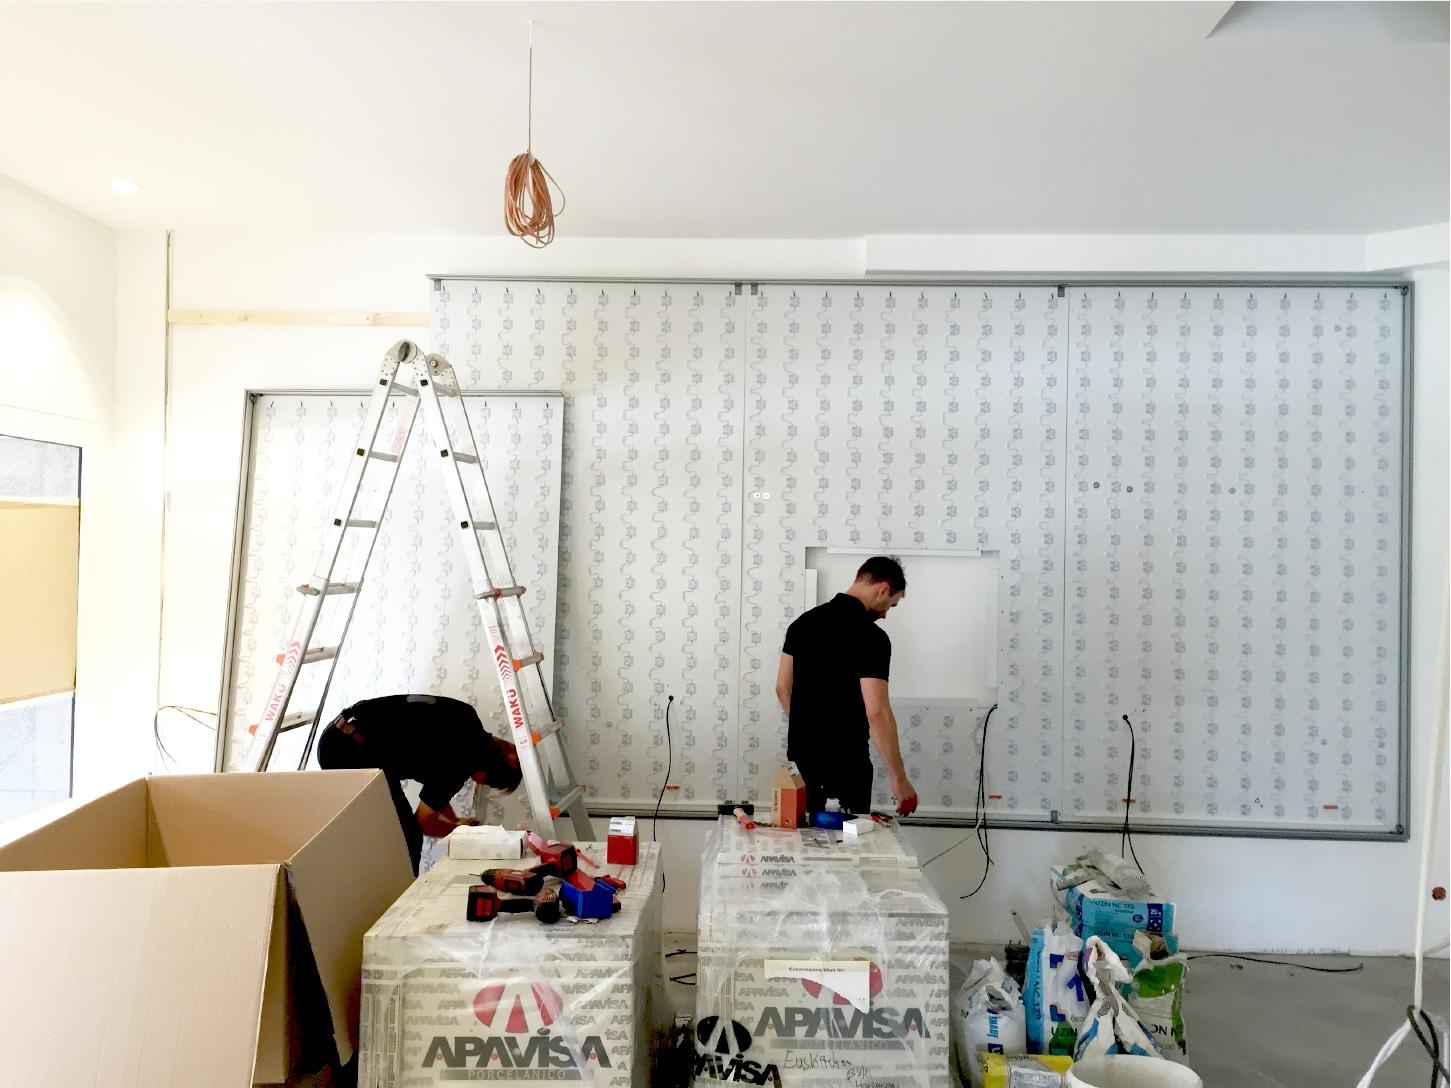 LED-Spannsystem im Aufbau